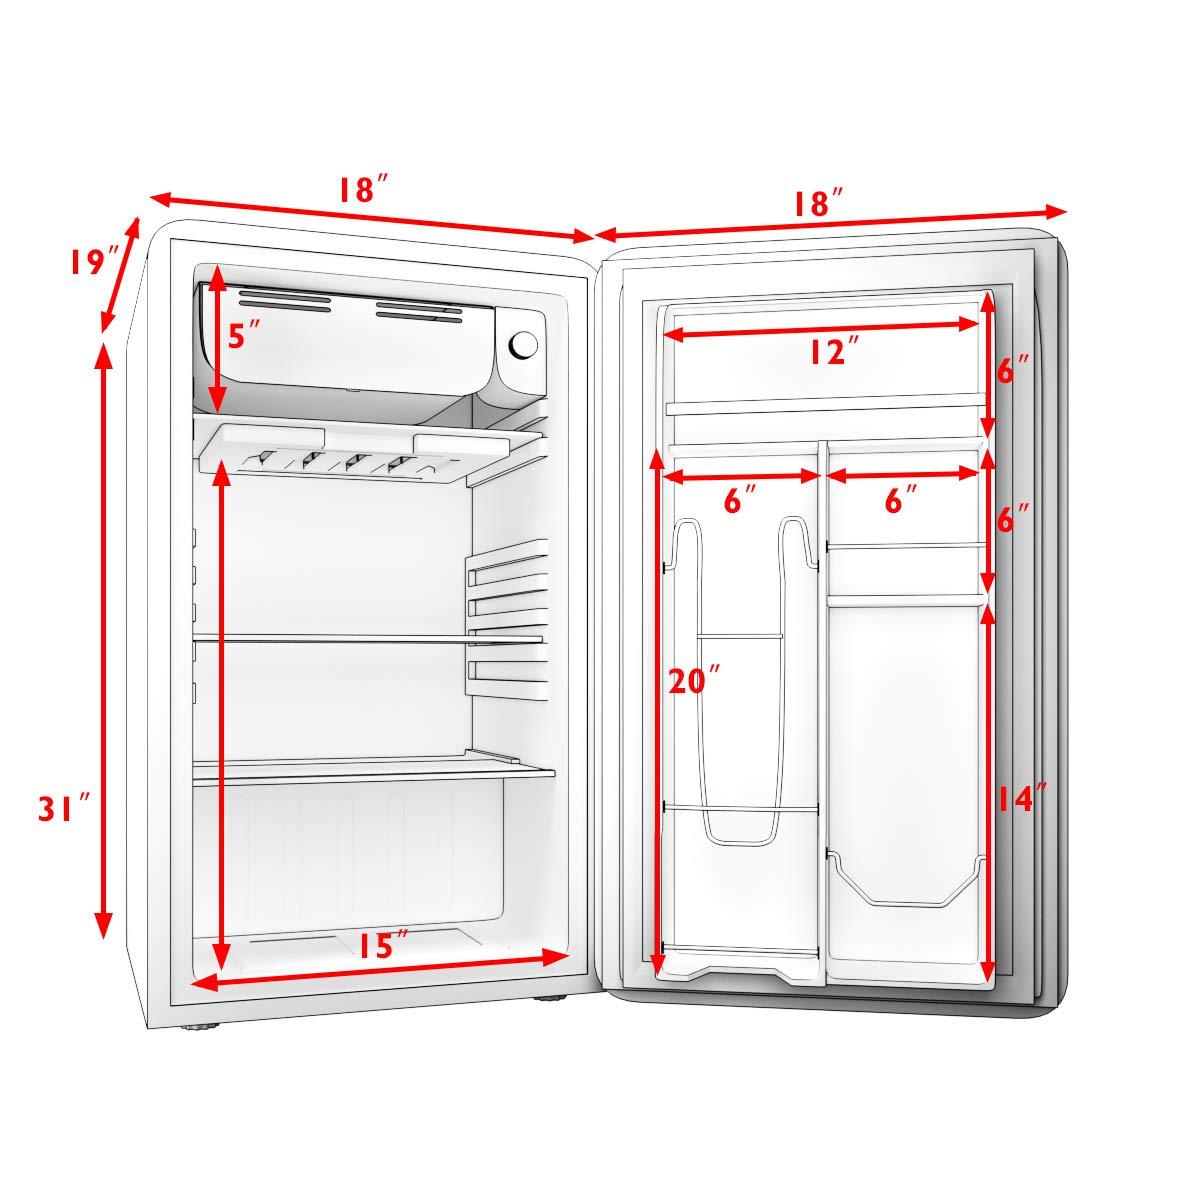 Office ft Single Door BLACK Small Under Counter Mini Refrigerator COSTWAY Compact Refrigerator Fridge Freezer Cooler Unit w//Handle for Dorm 3.2 cu Apartment